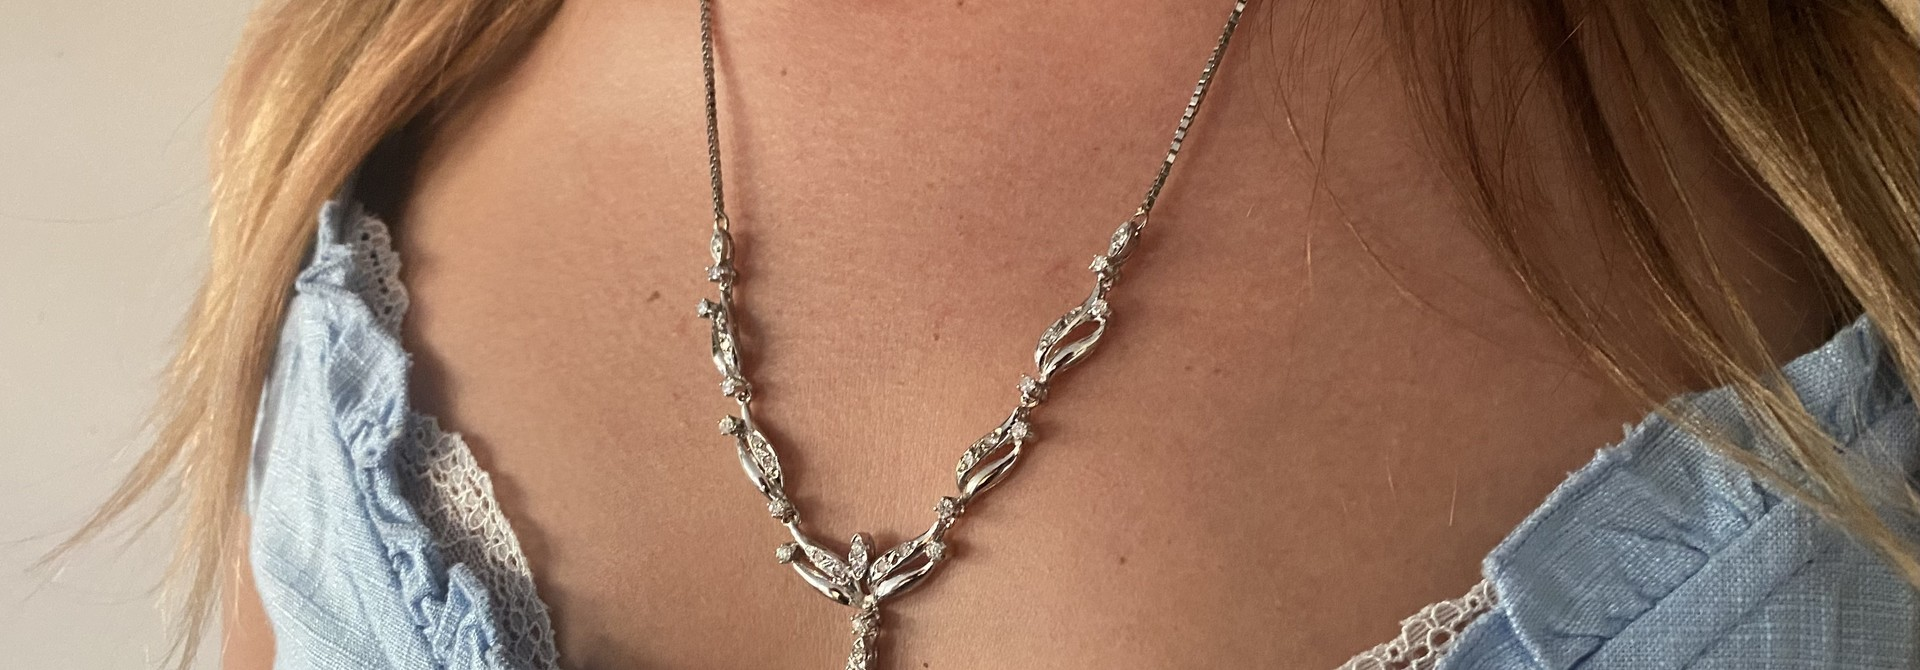 Ketting witgoud met diamantjes